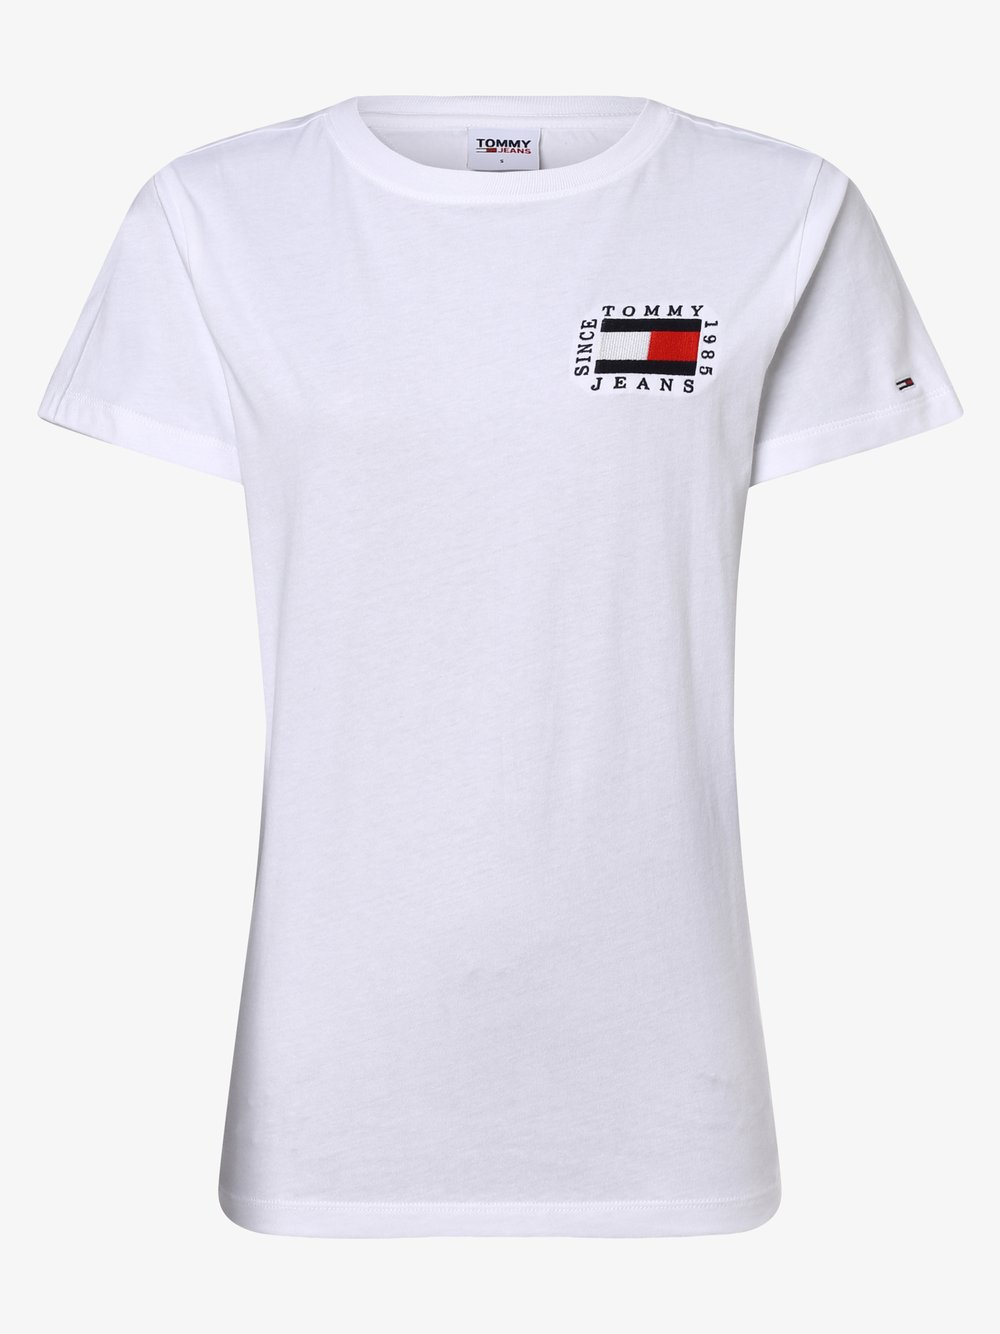 Tommy Jeans - T-shirt damski, biały